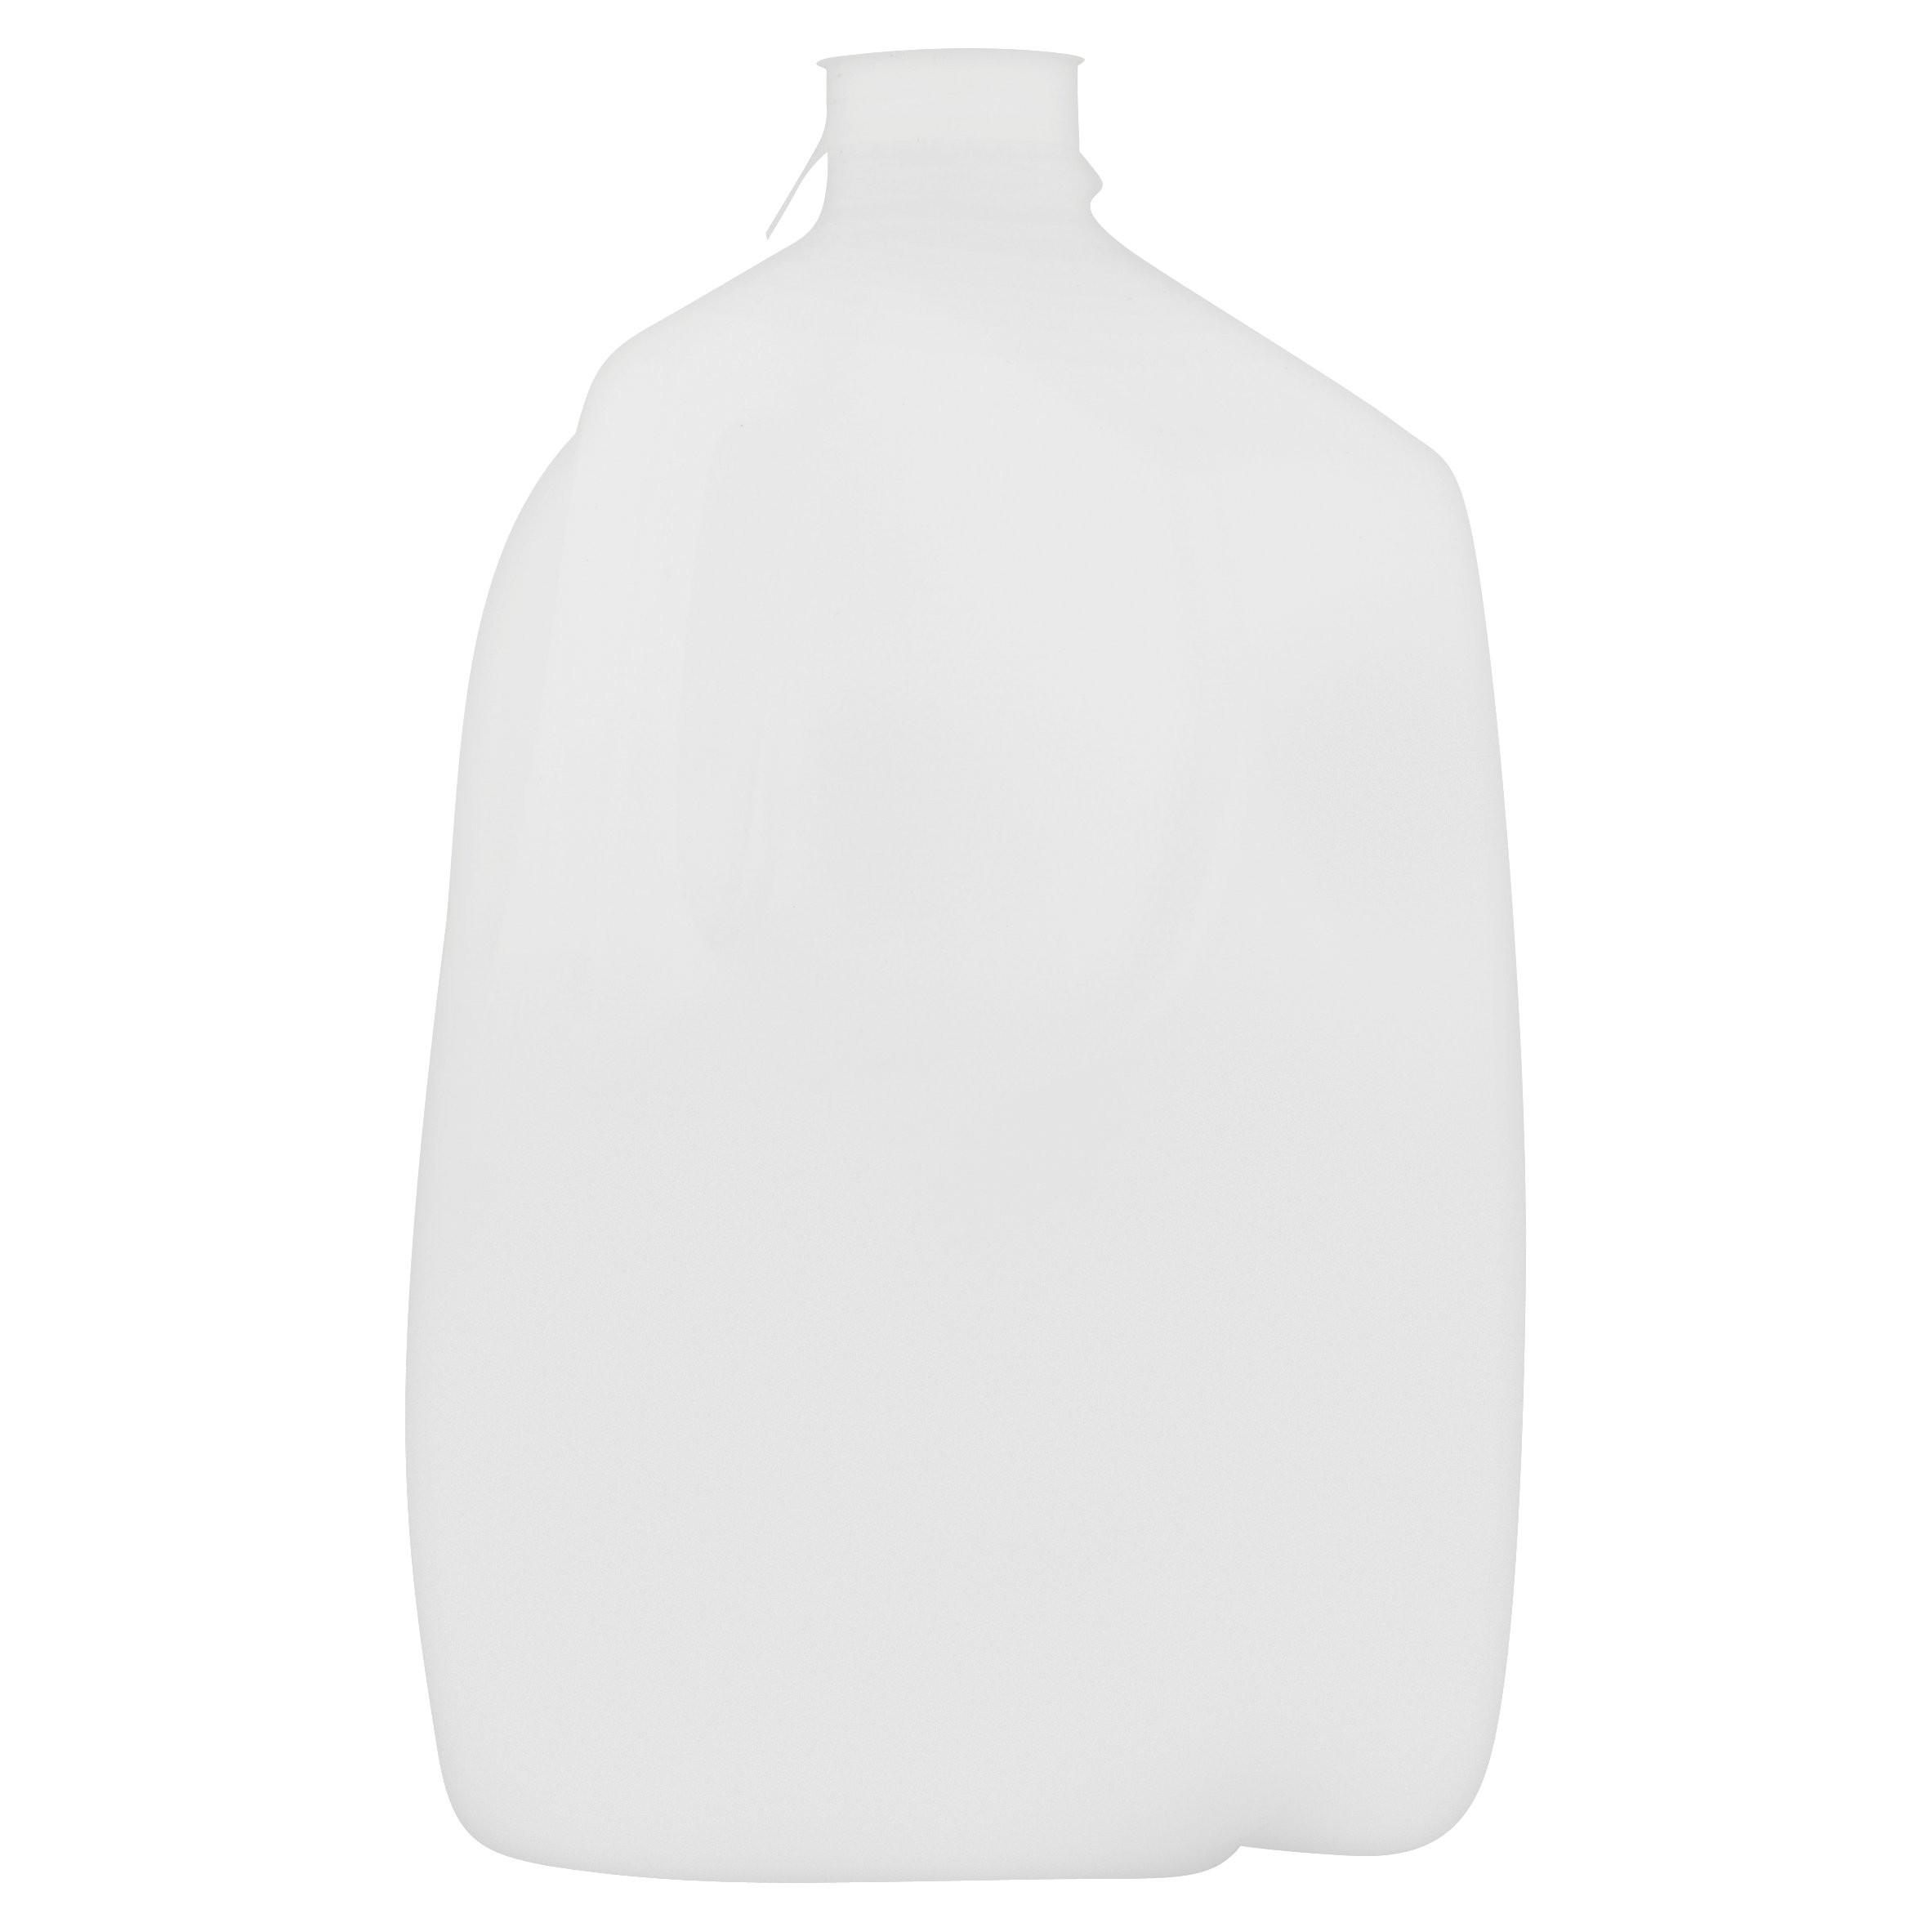 scandinavian bubble glass vase of parents choice infant water 1 gal walmart com pertaining to e0d91127 5116 4276 af19 b50ee15eafdb 1 6c5369d807cd8039cc327db5f4423ed1